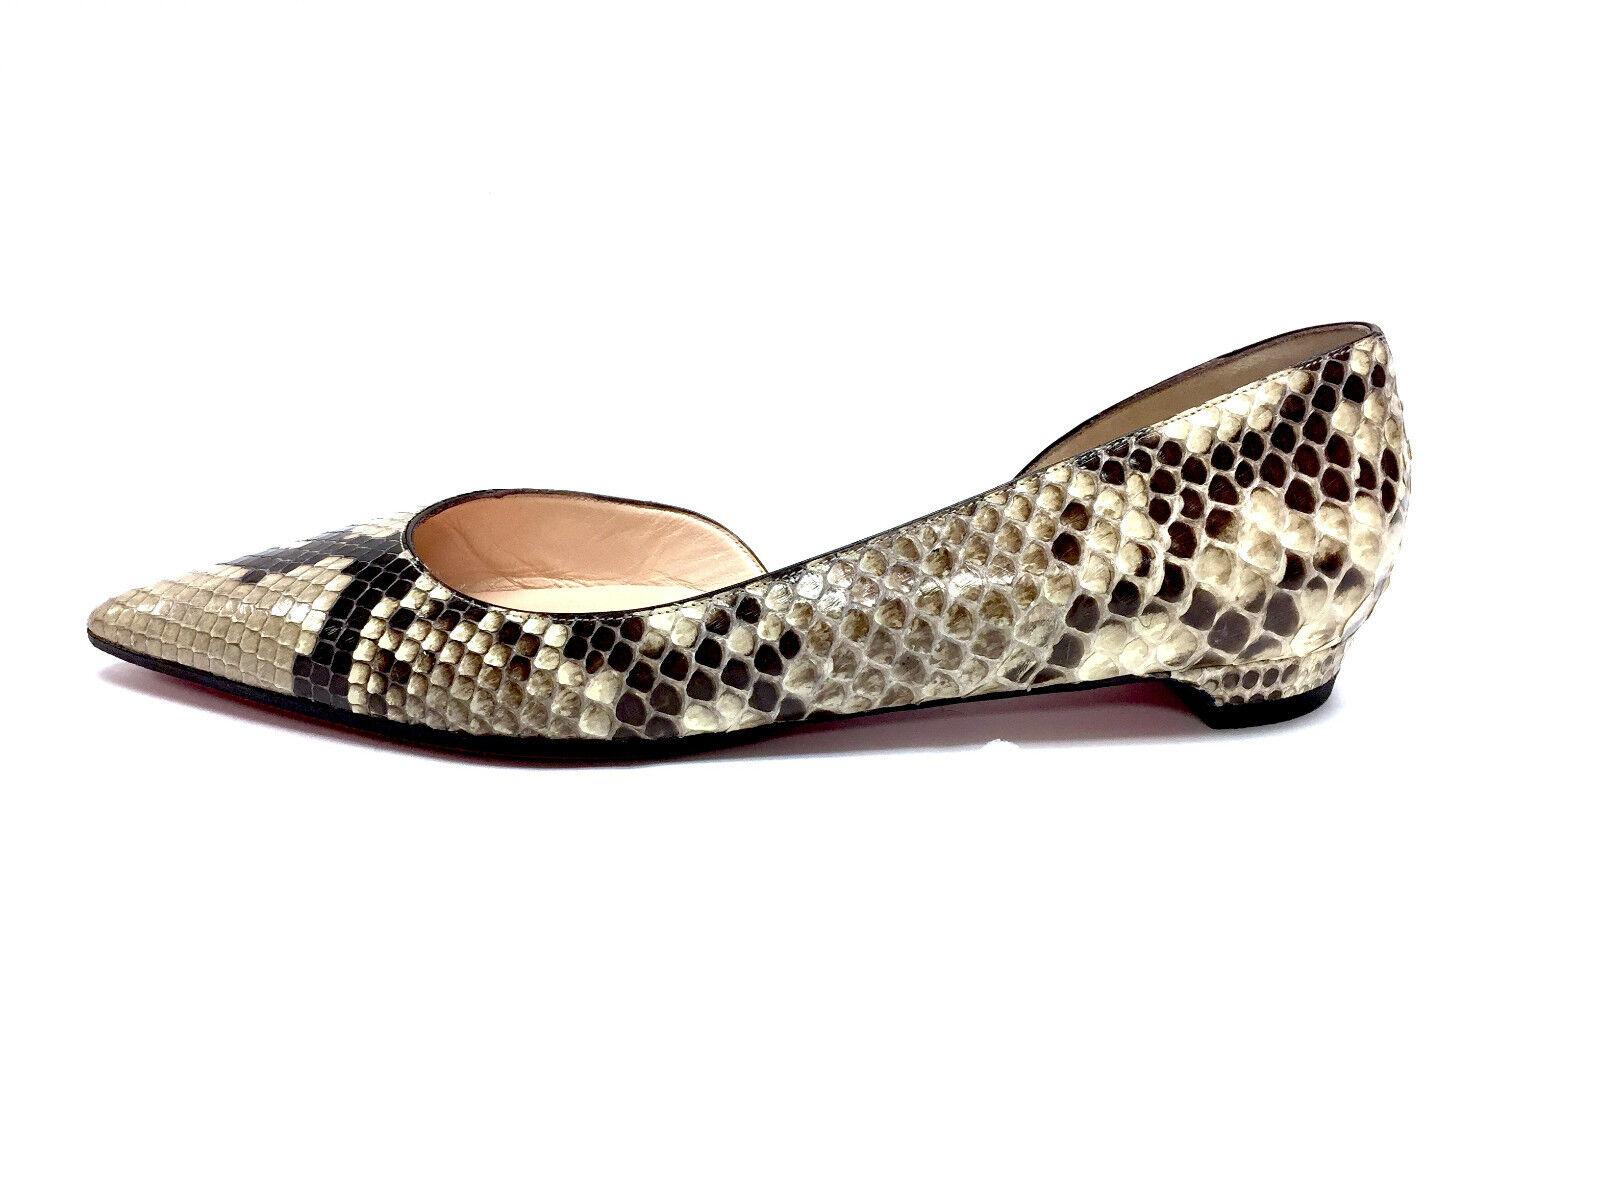 CHRISTIAN LOUBOUTIN LOUBOUTIN LOUBOUTIN Brown Beige Python Skin Flats Sz40 2f89e3